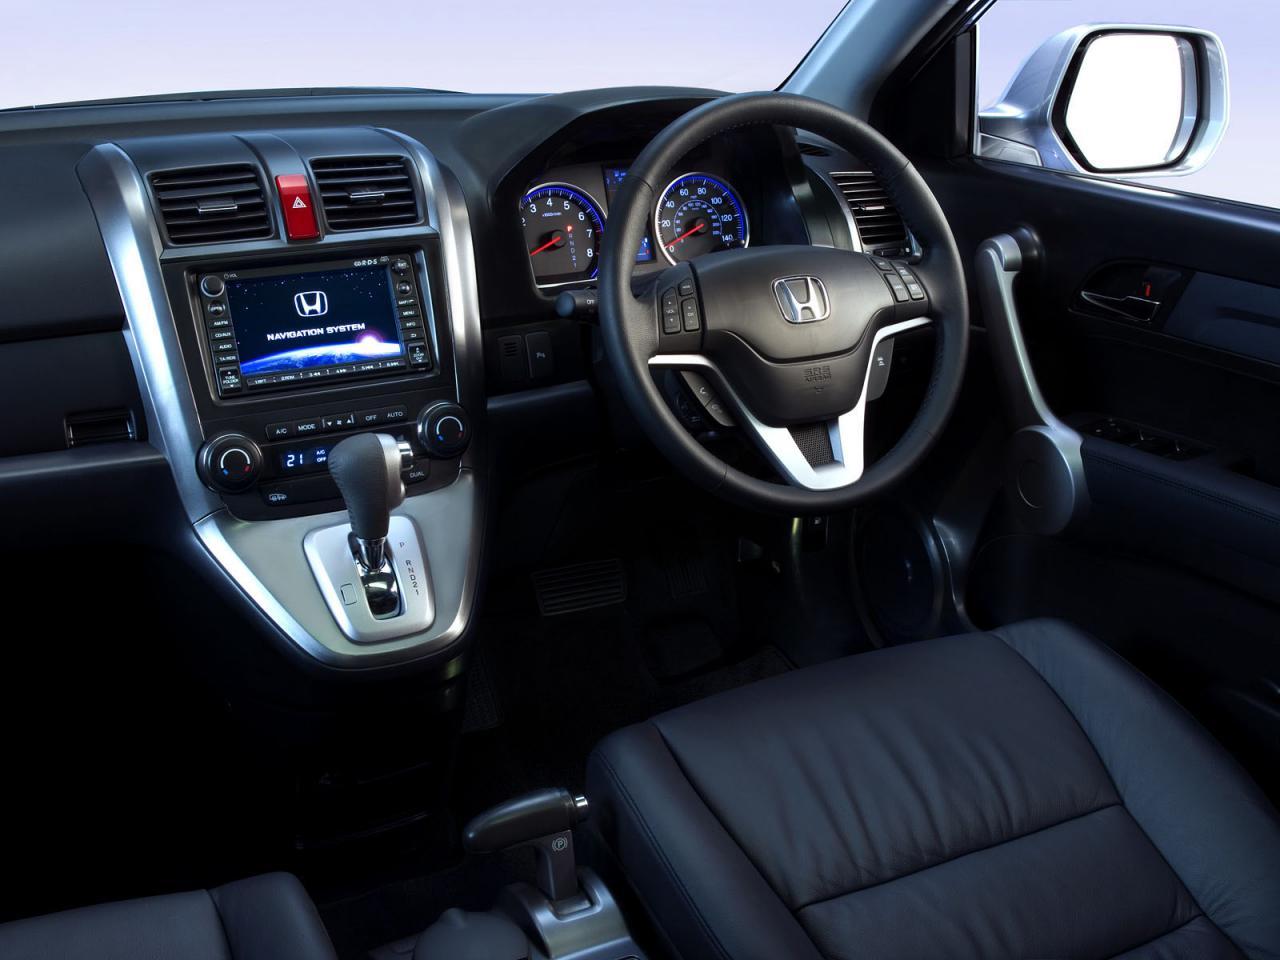 2006 honda cr v crv 01inside2006 for Honda crv 2006 interior